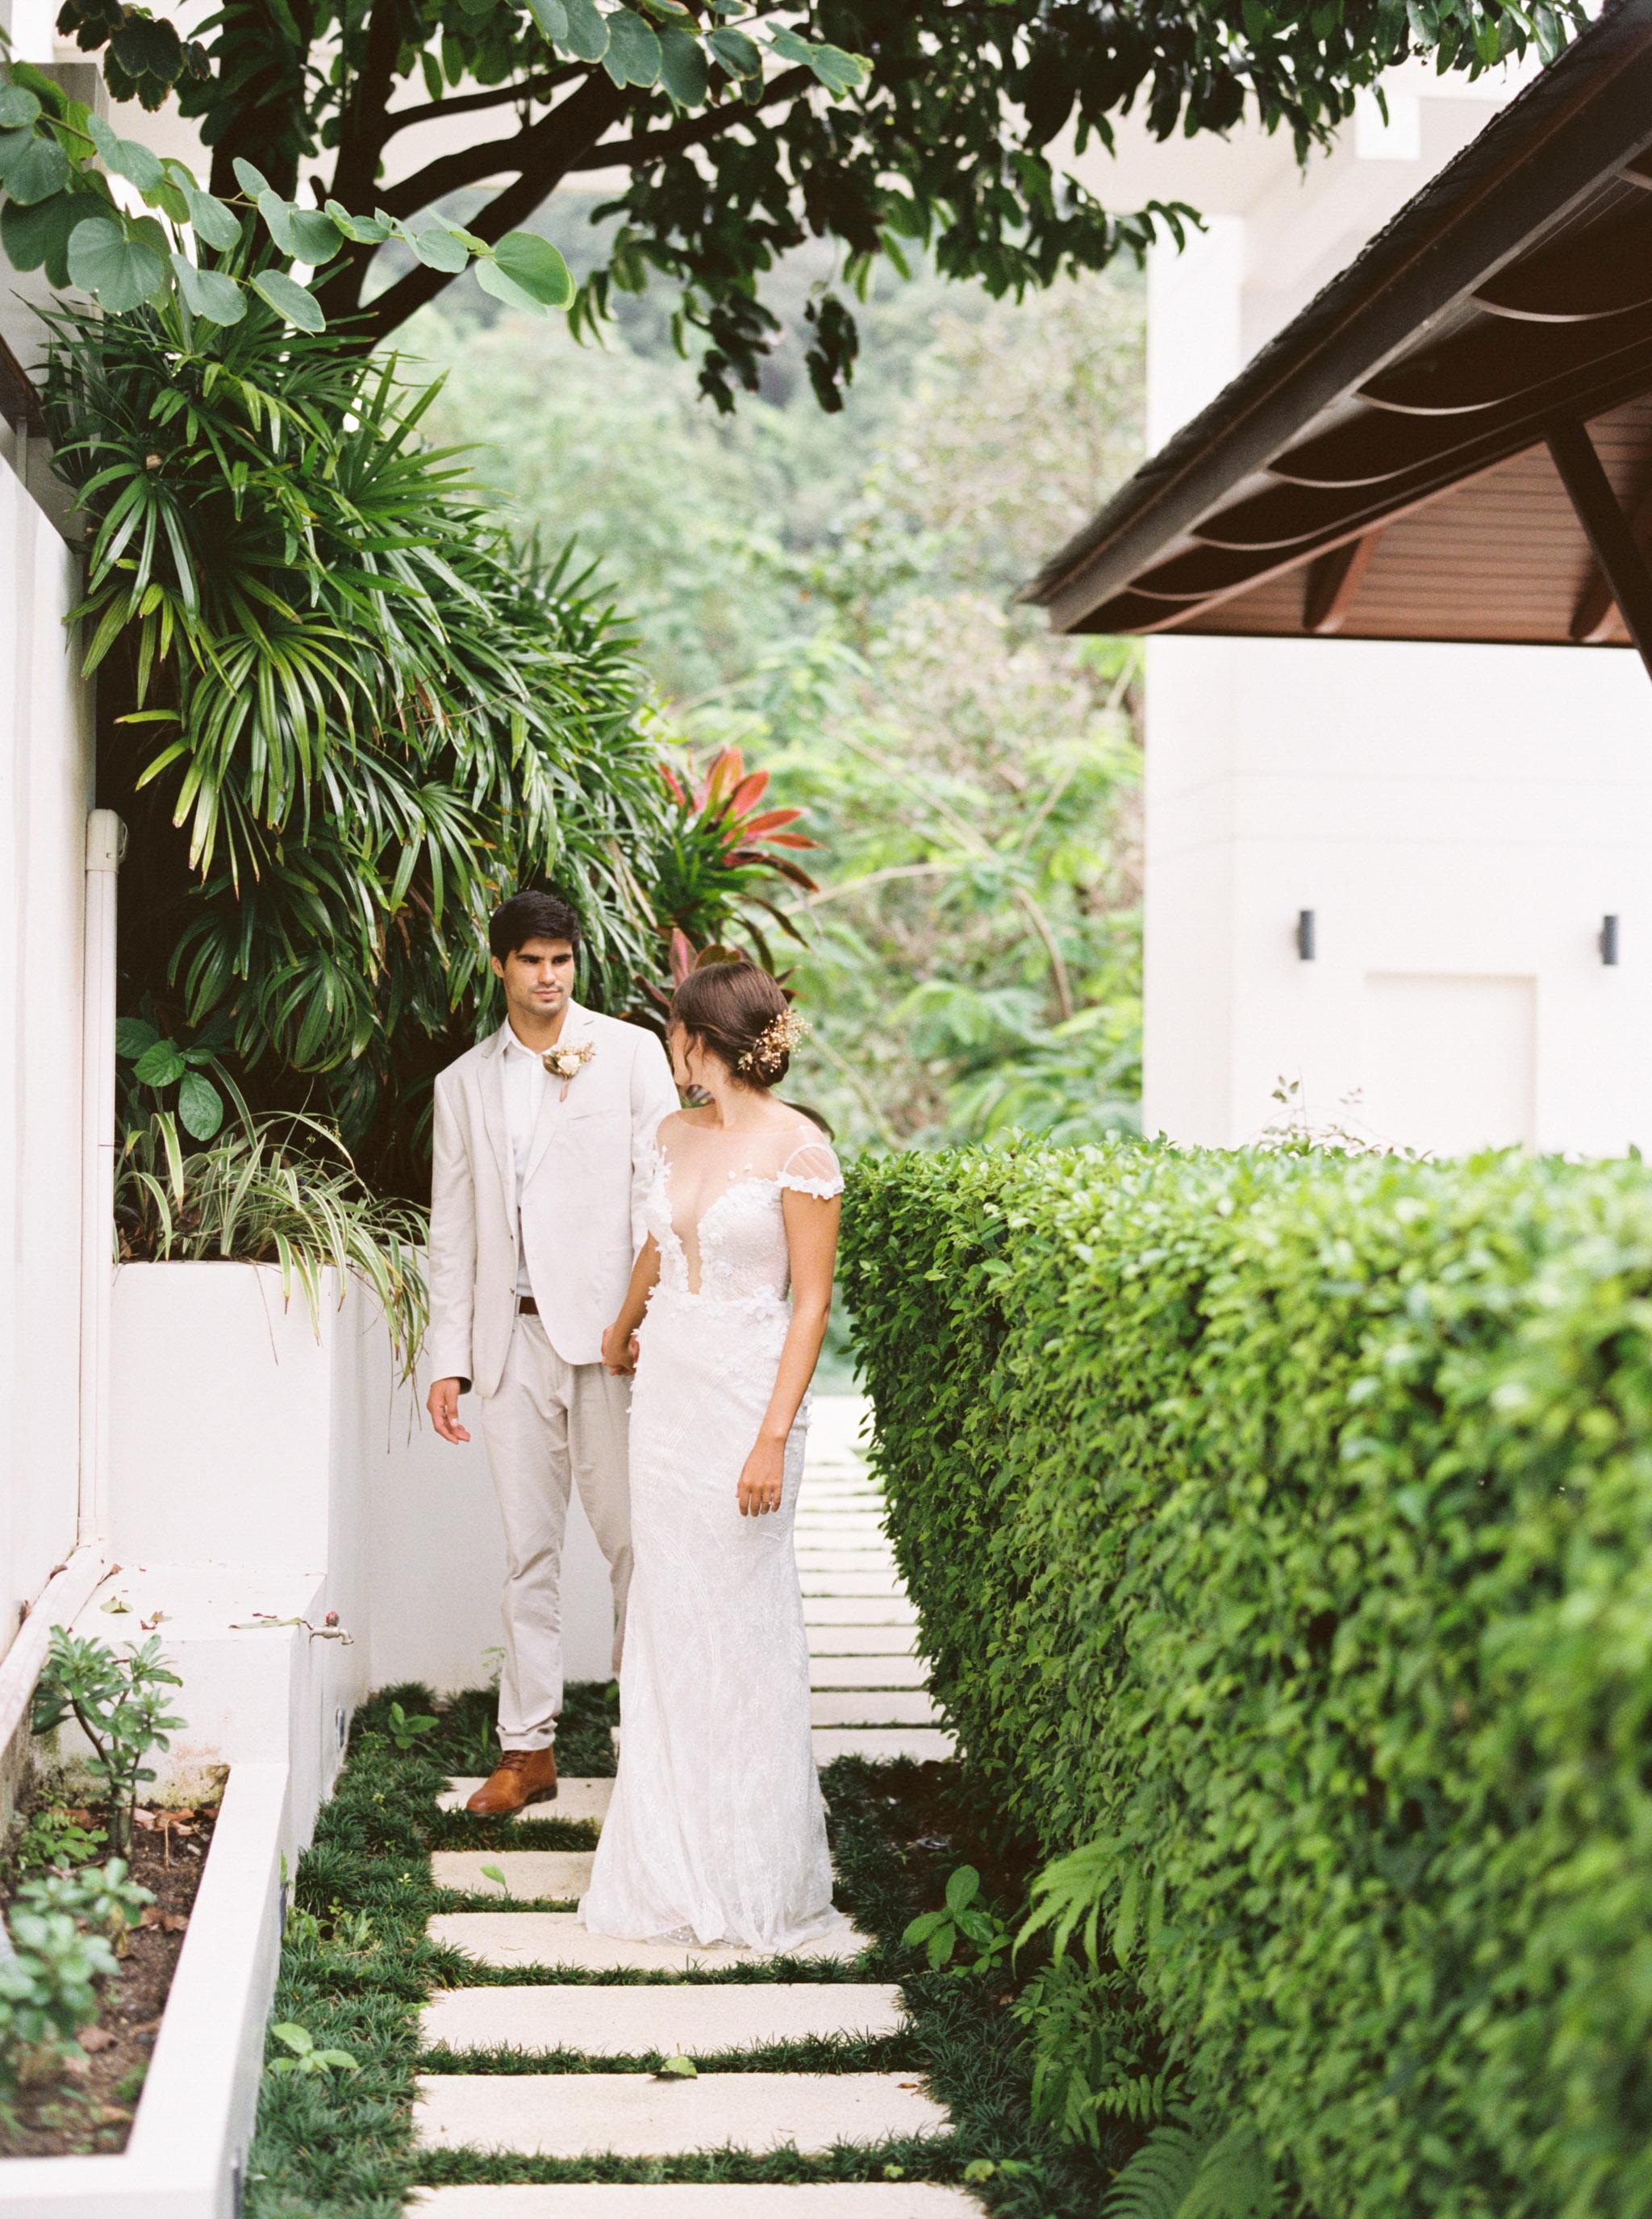 Destination Wedding Phuket Thailand Fine Art Film Photographer Sheri McMahon-00038-38.jpg